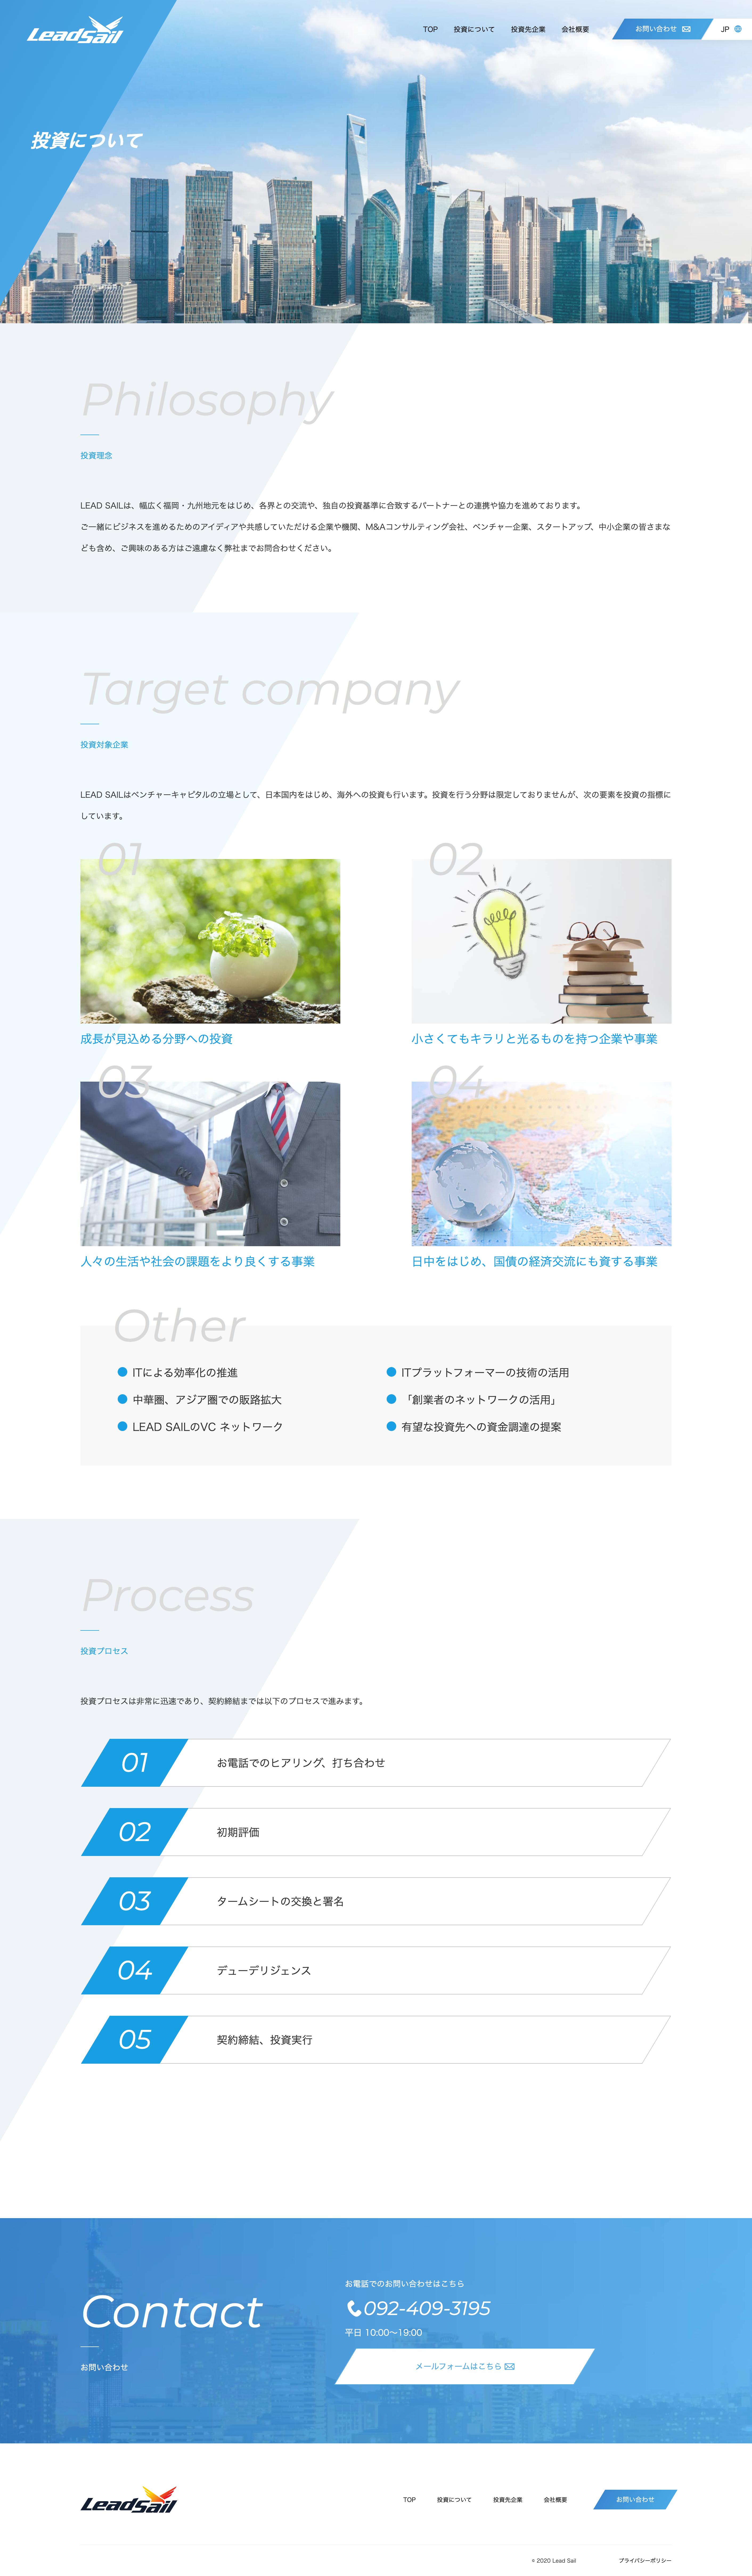 株式会社Lead Sail様 PC画像